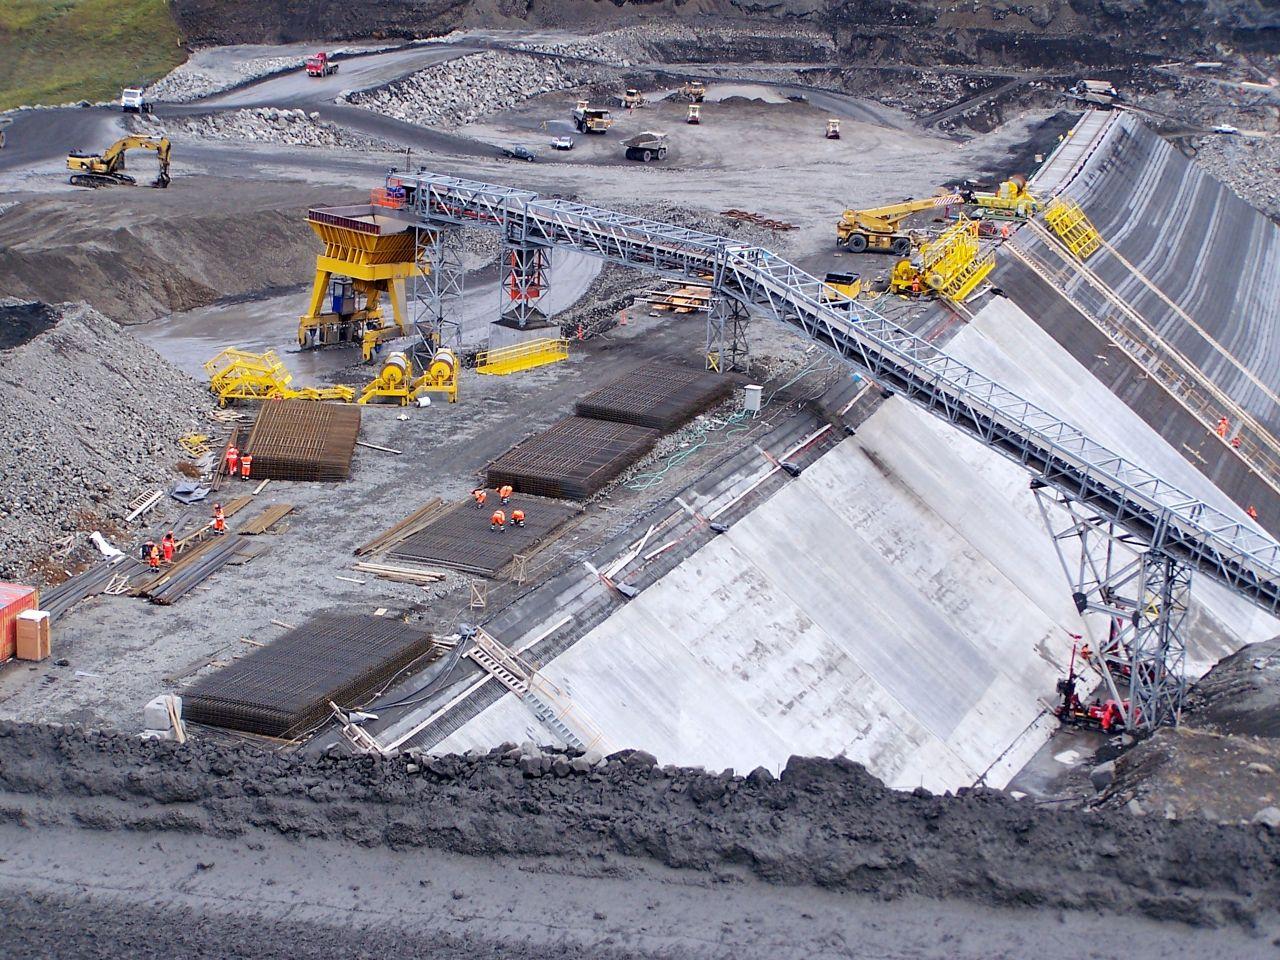 Construction site of Karahnjukar Hydropower Plant in Iceland